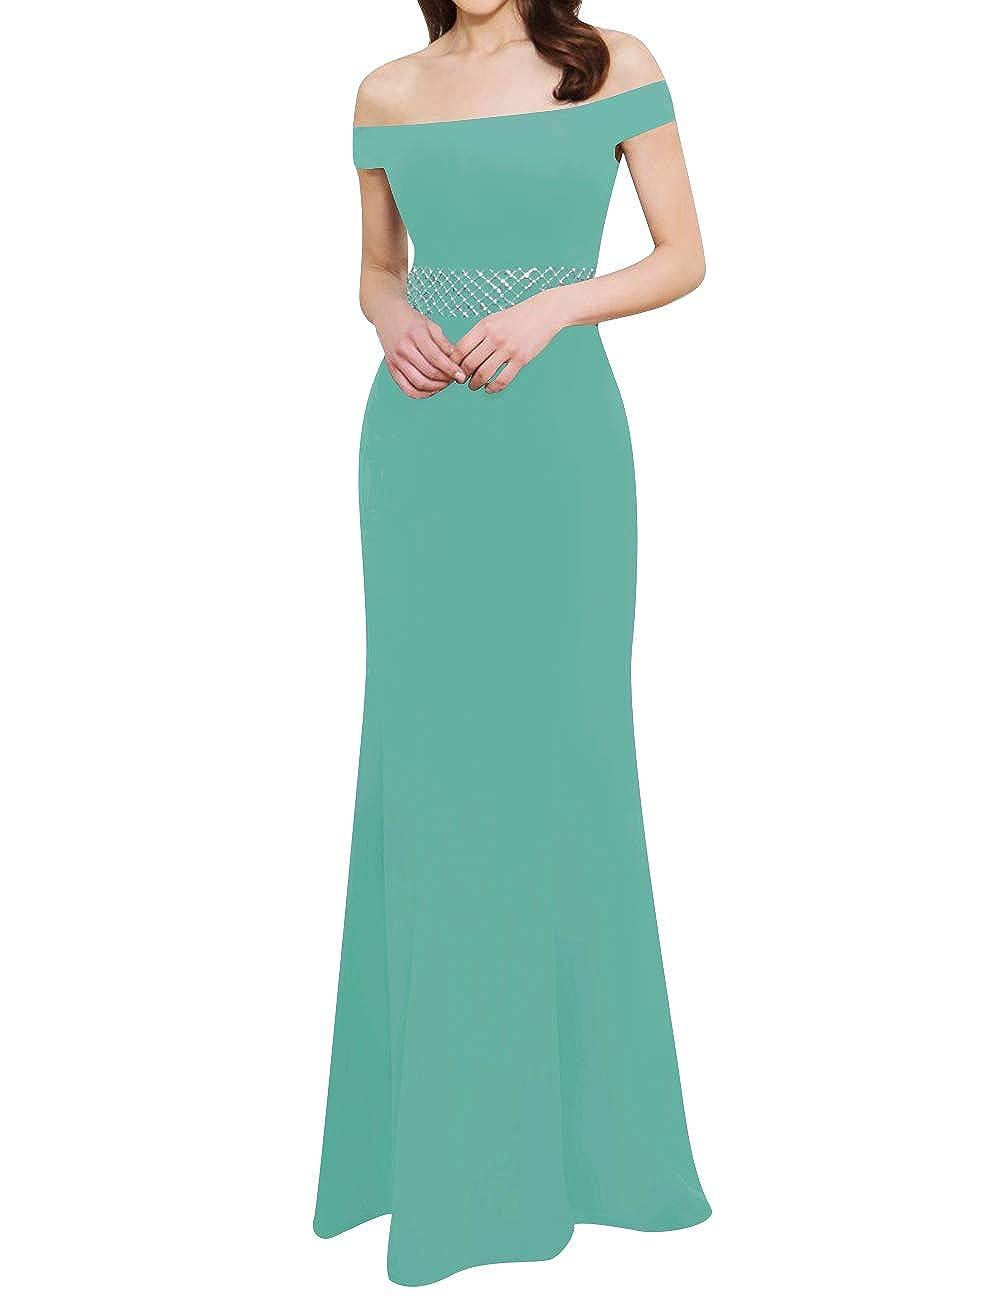 Hunter ASBridal Evening Dress Mermaid Prom Dresses with Short Sleeve Long Satin Evening Formal Gowns Off Shoulder